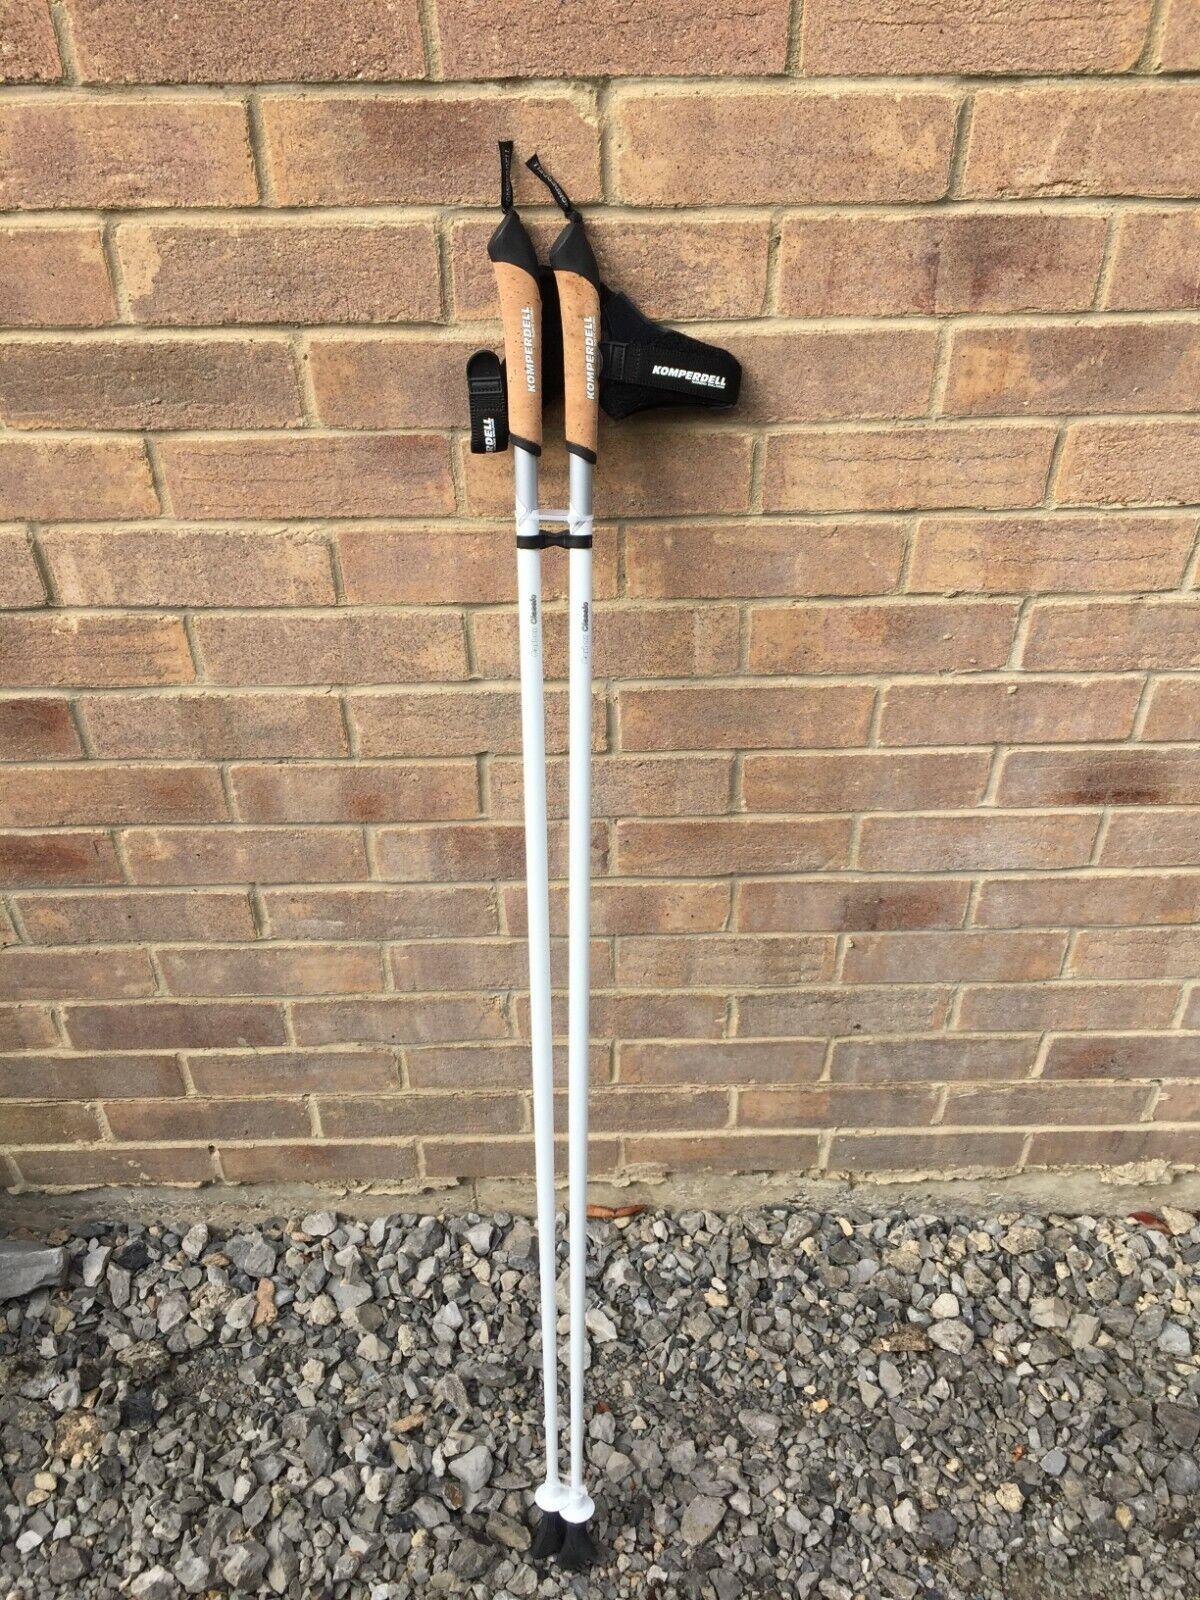 KOMPERDELL Nordic Walking Poles Balance 115 cm Red black new